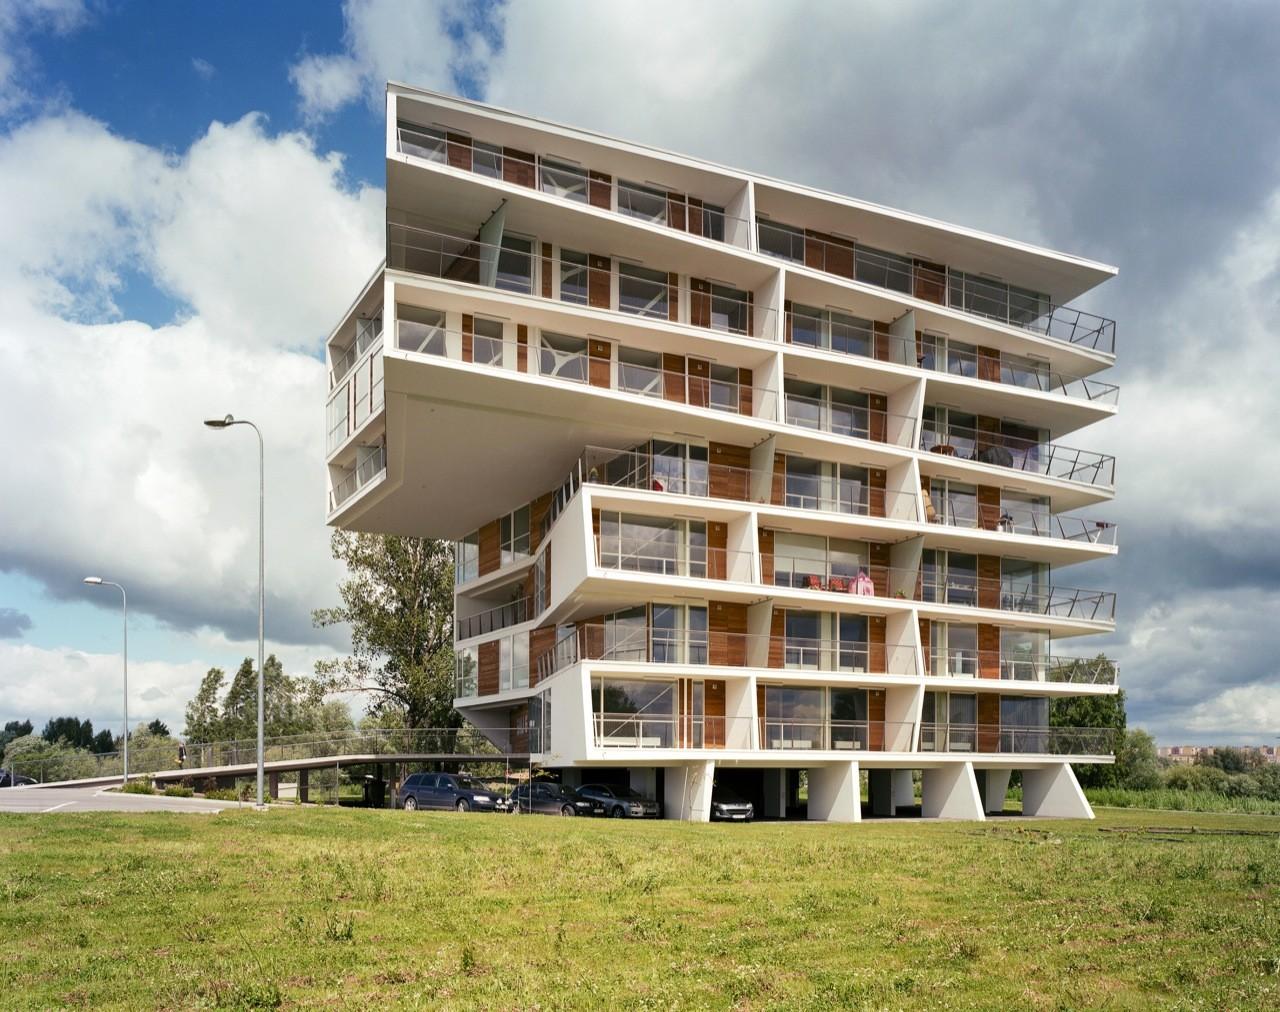 Tartu Rebase Street / Atelier Thomas Pucher + Bramberger [architects], © Lukas Schaller